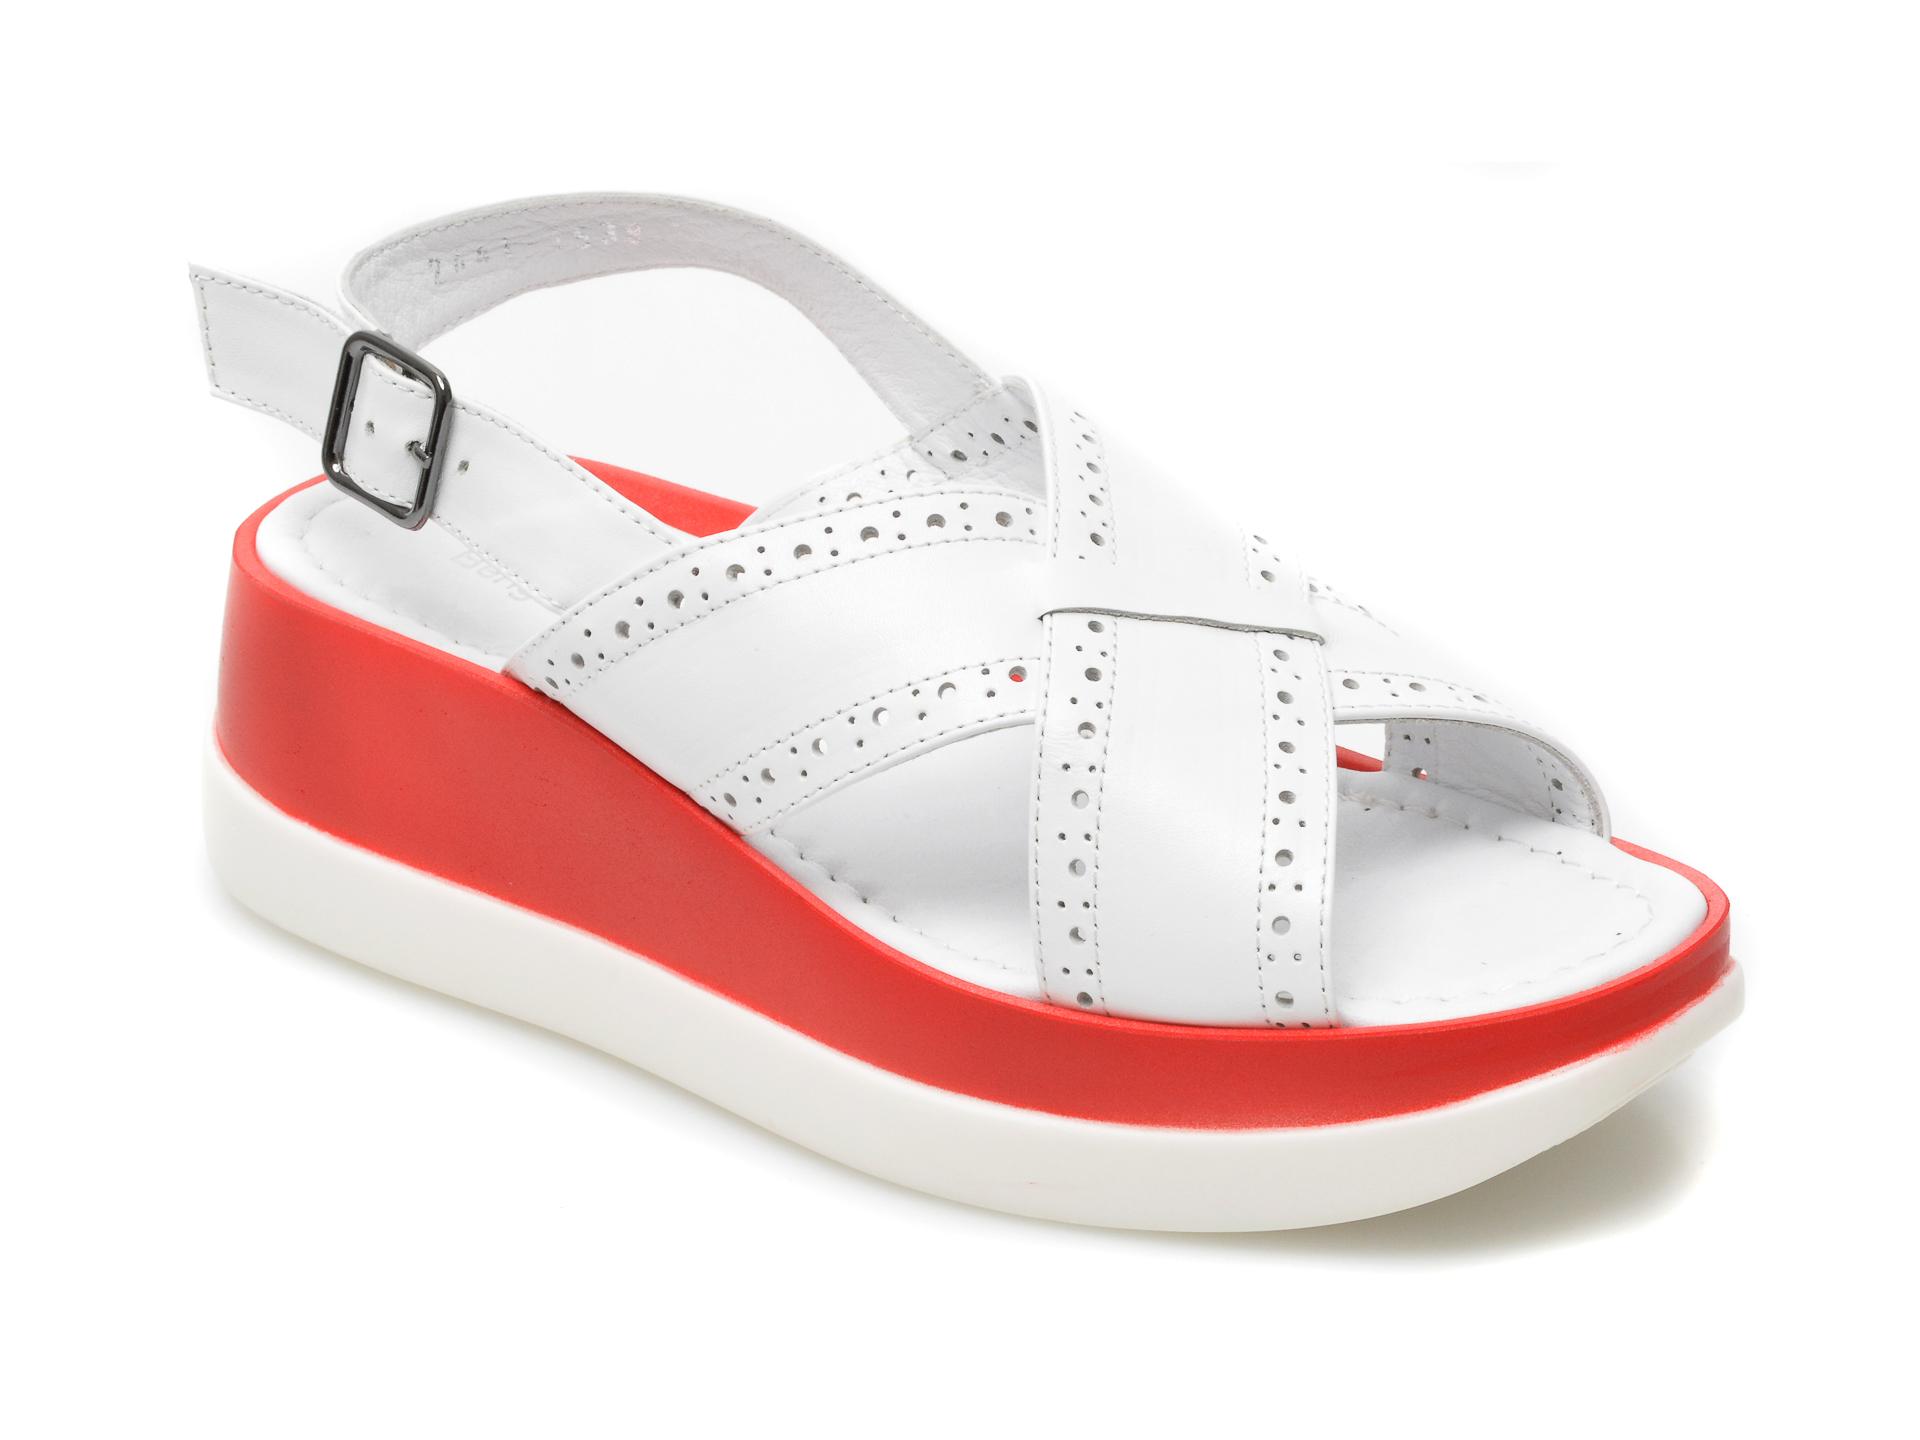 Sandale BENGZO BALDINI albe, Z2488, din piele naturala imagine otter.ro